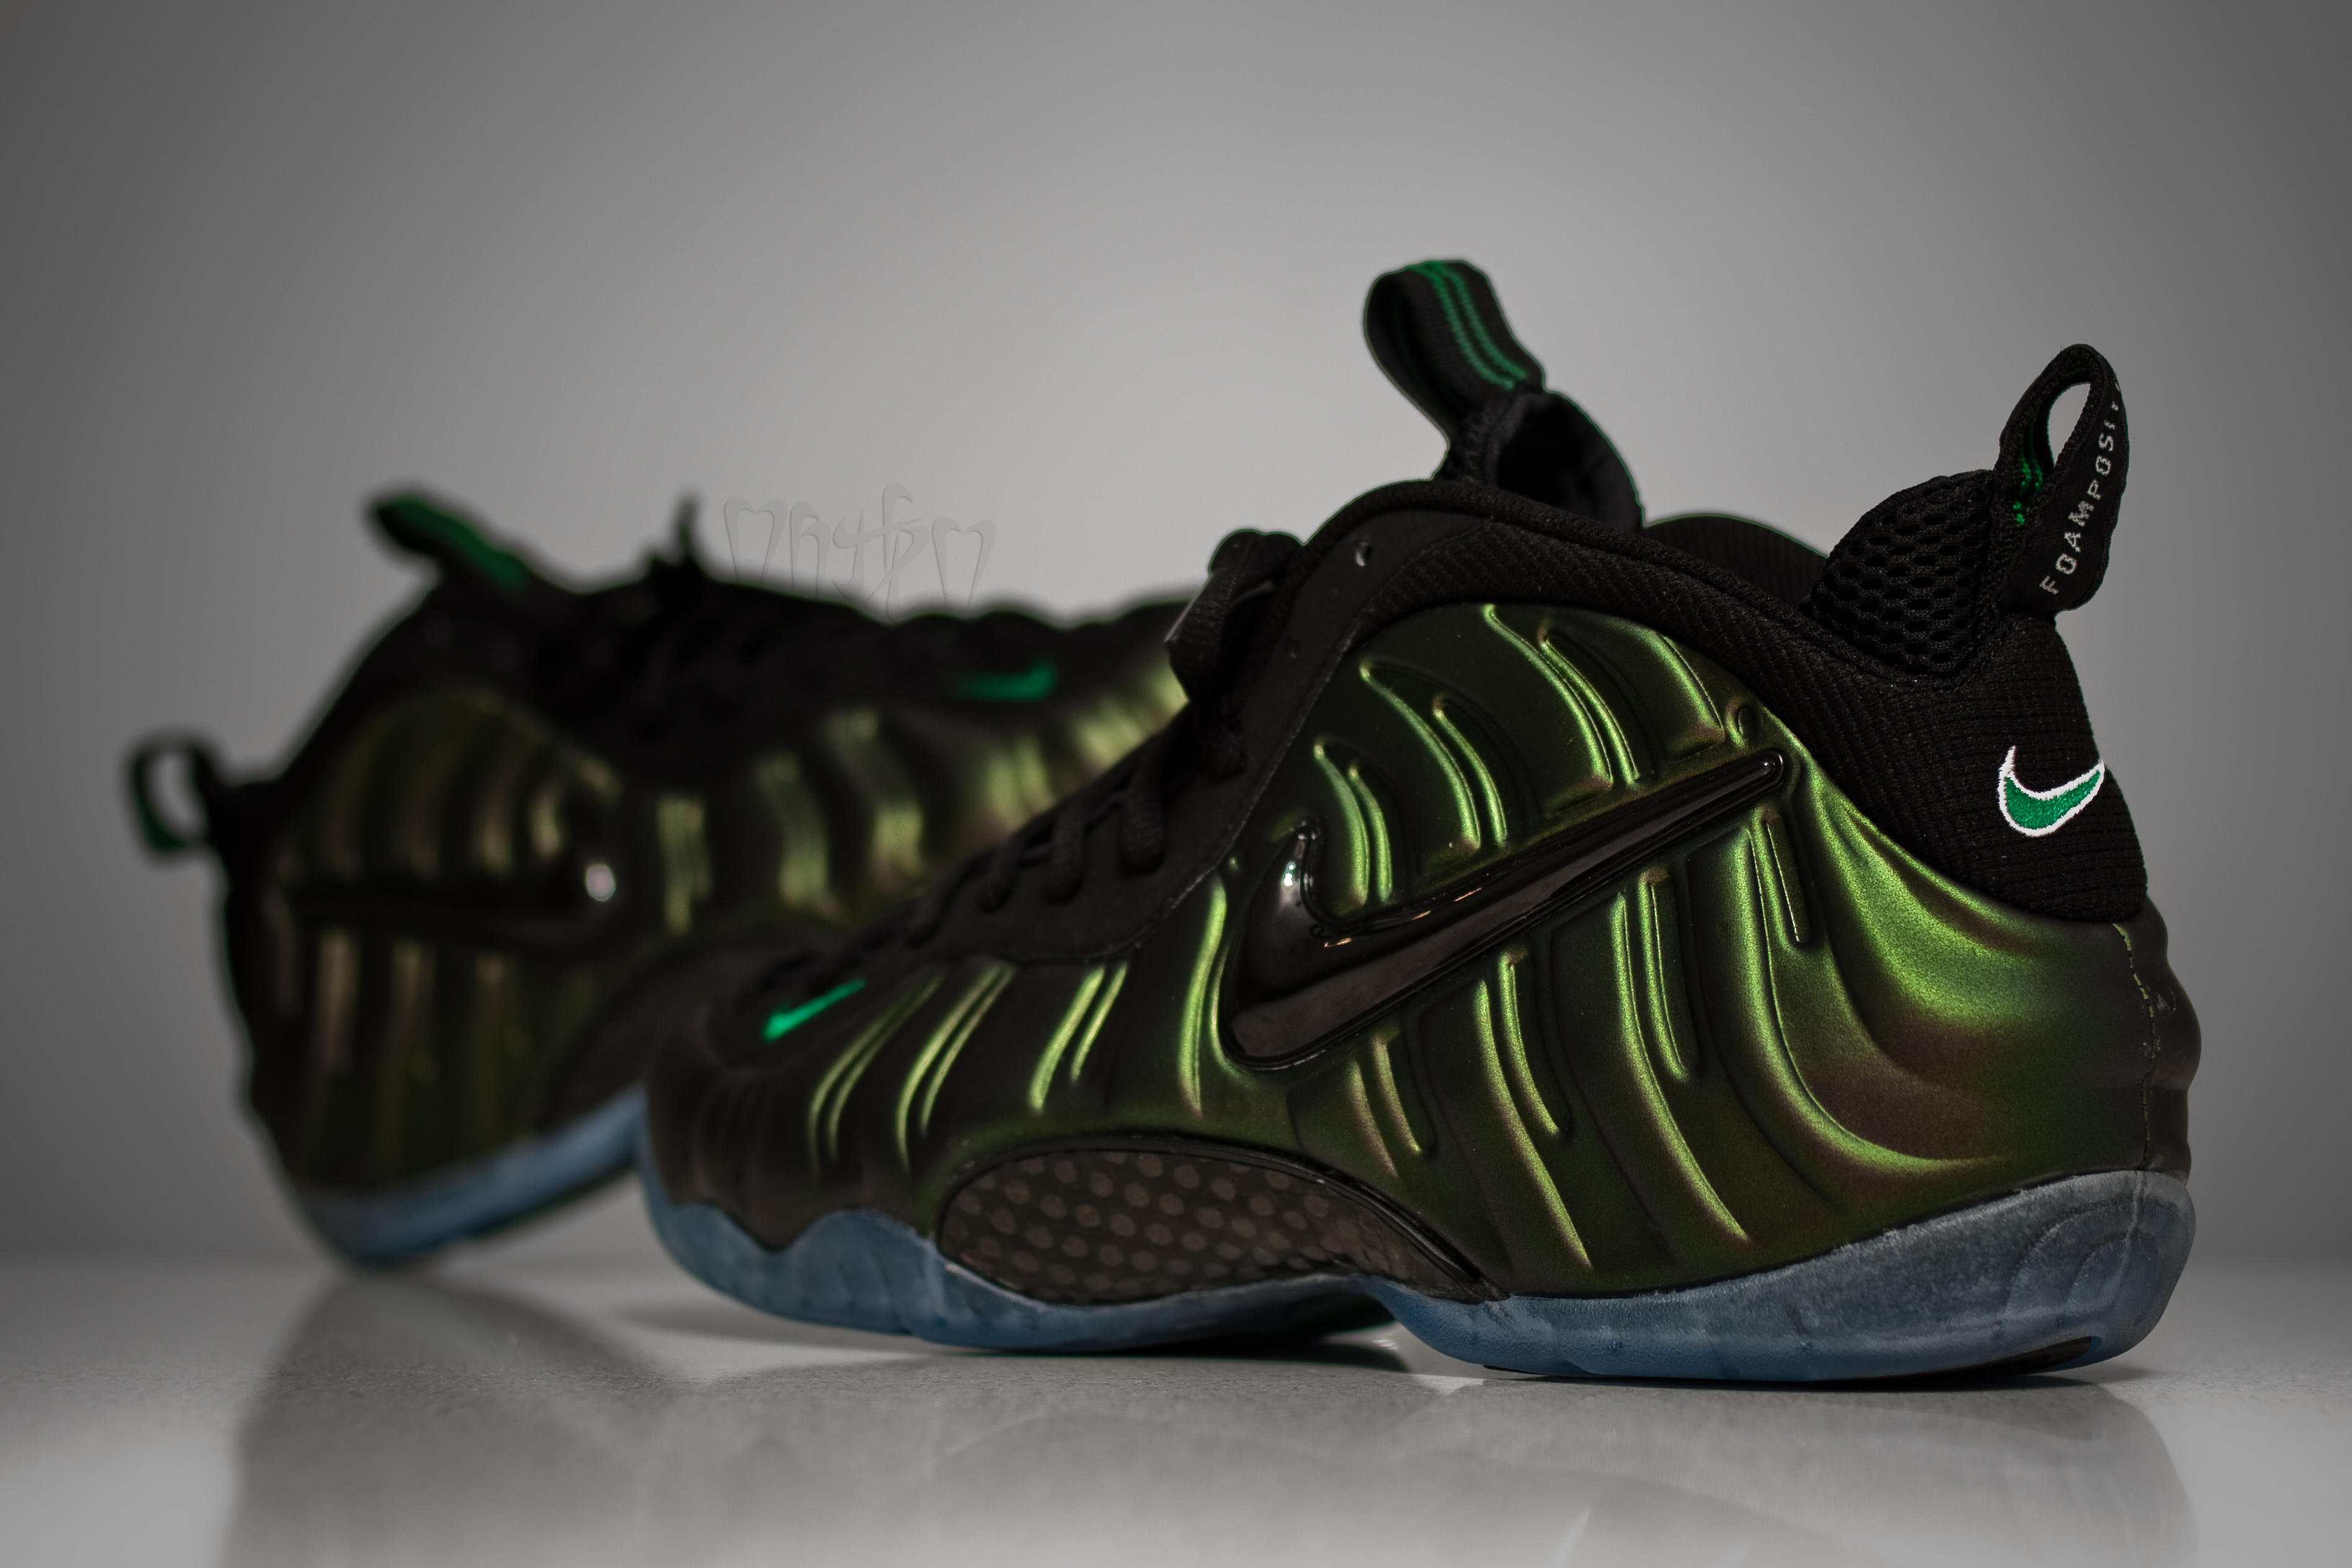 buy popular 2f37b df955 Nike Air Foamposite Pro - Dark Pine/Black - Release 09/2011 ...